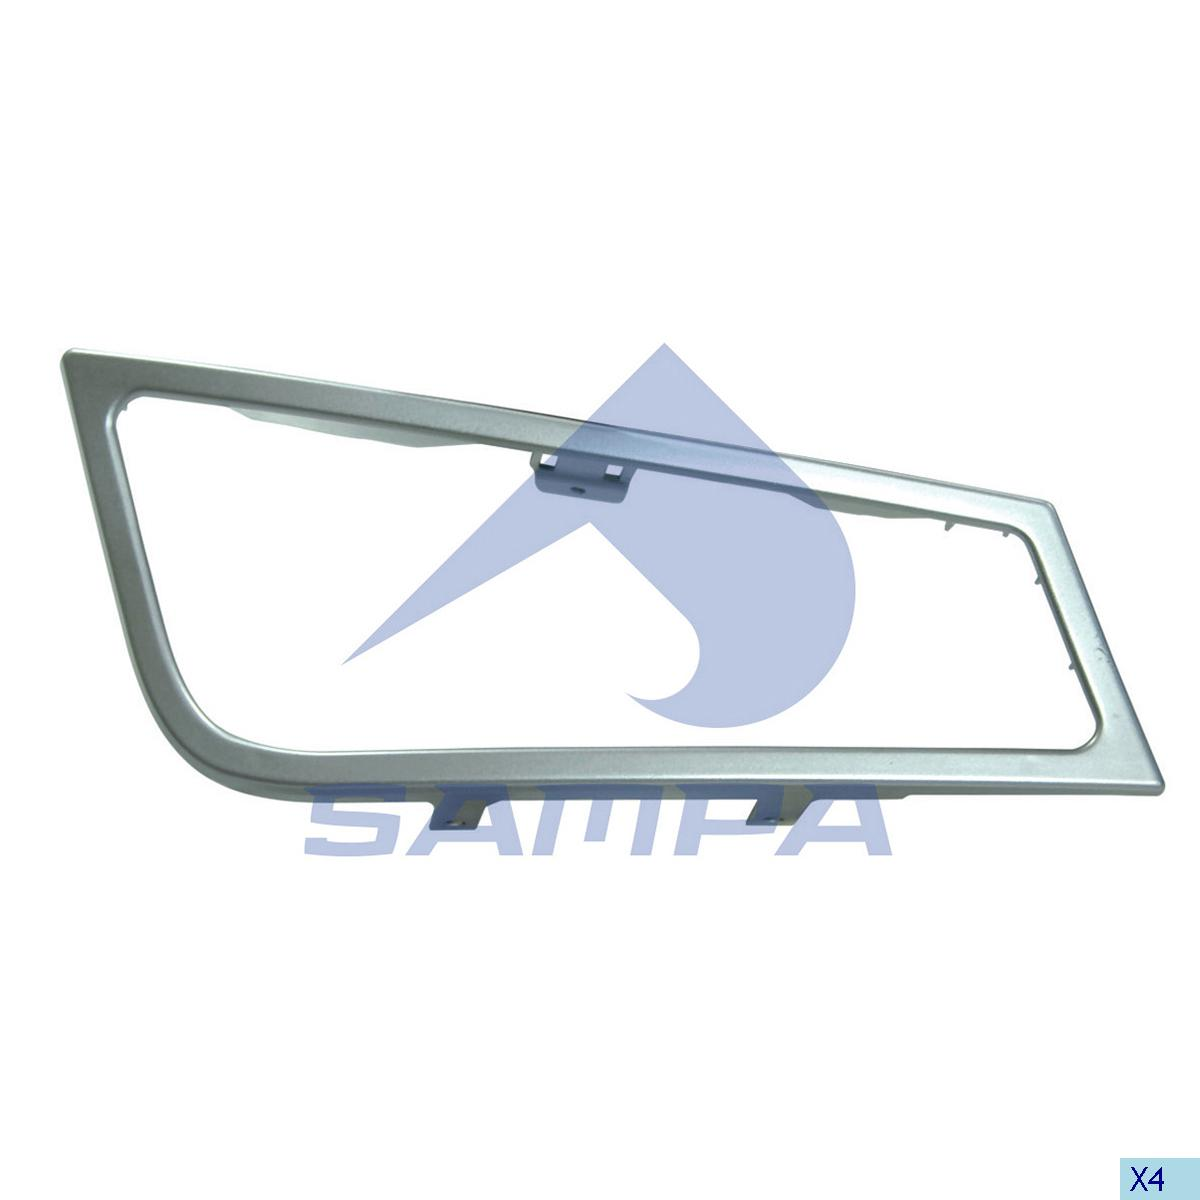 Frame, Fog Lamp, Volvo, Electric System